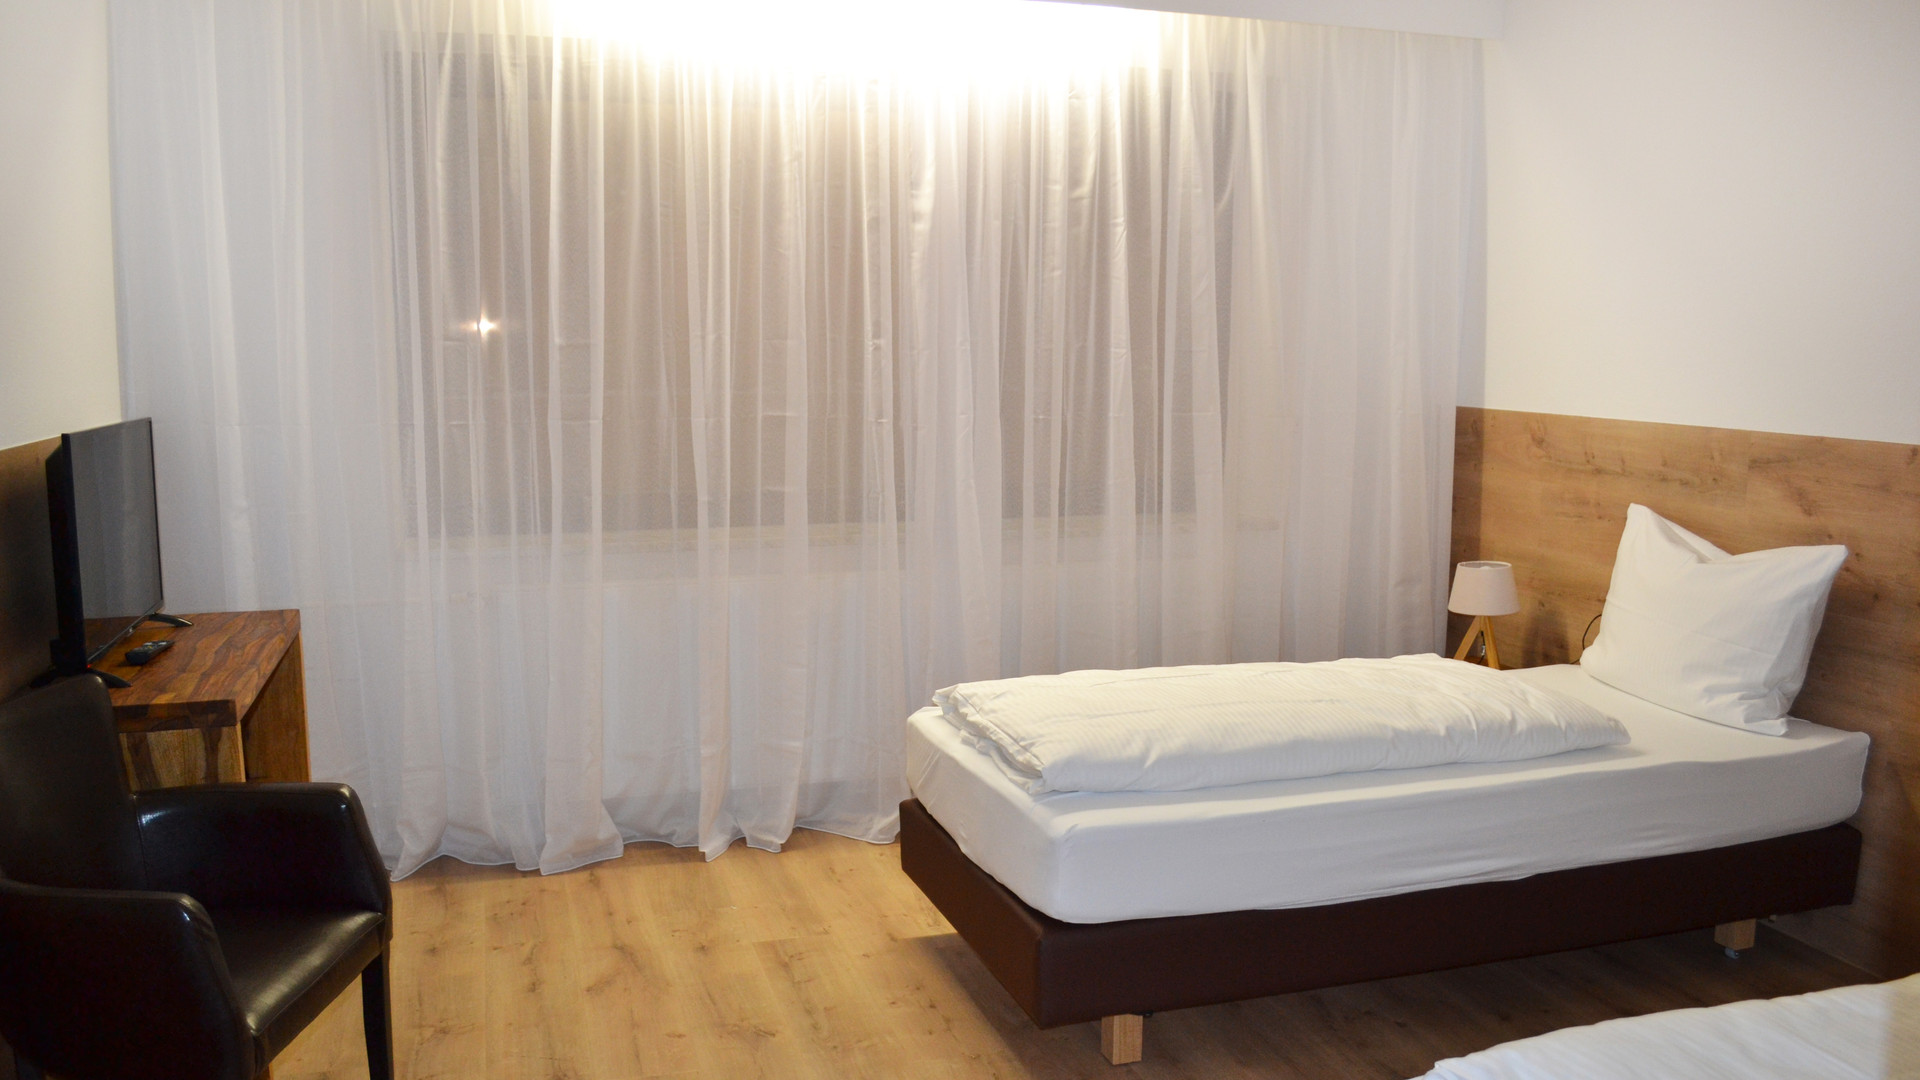 Monteurzimmer Zweibettzimmer